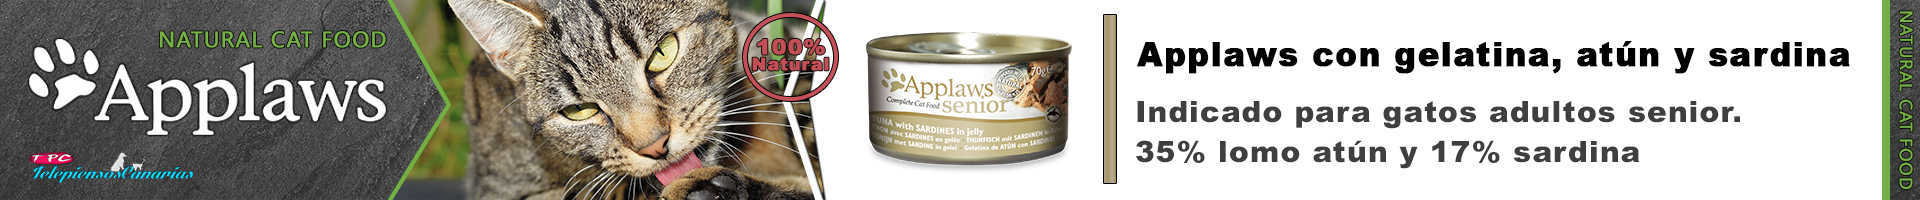 Applaws lata con gelatina de atún y sardina, para gatos senior